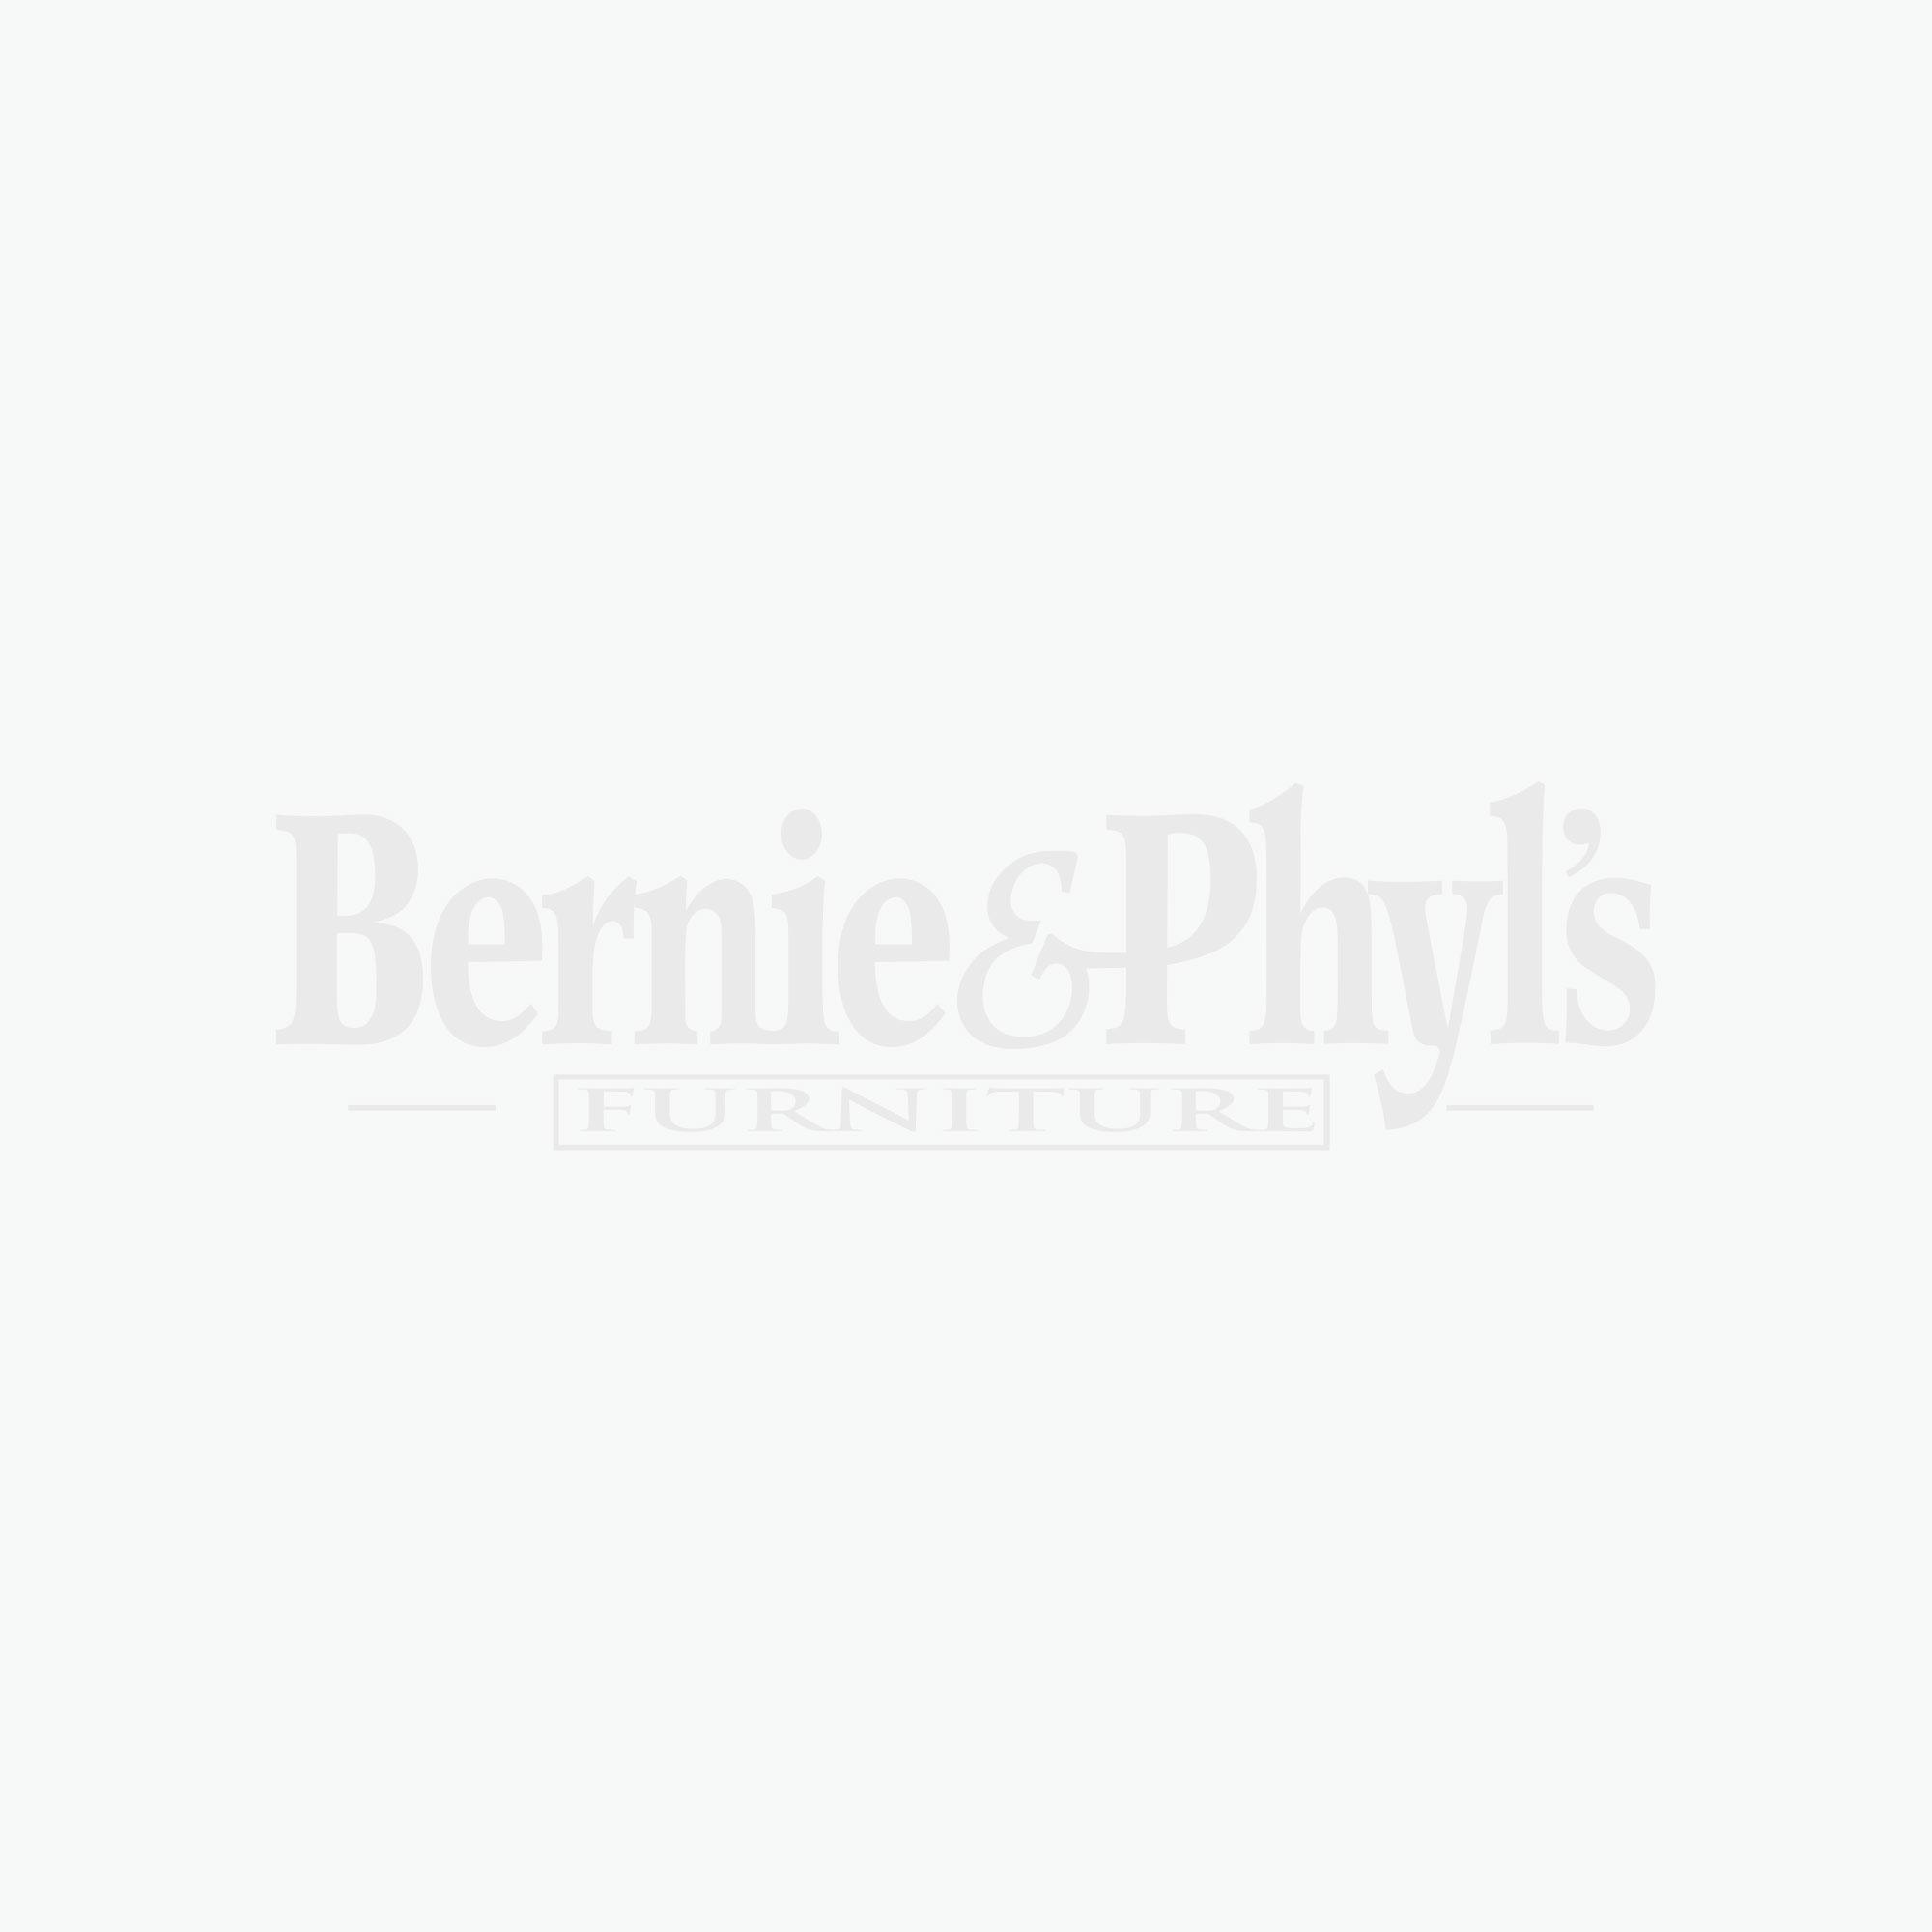 Serphina Medium Rug - Fuchsia - (Set of 1) - R400162 by Ashley Furniture Signature Design